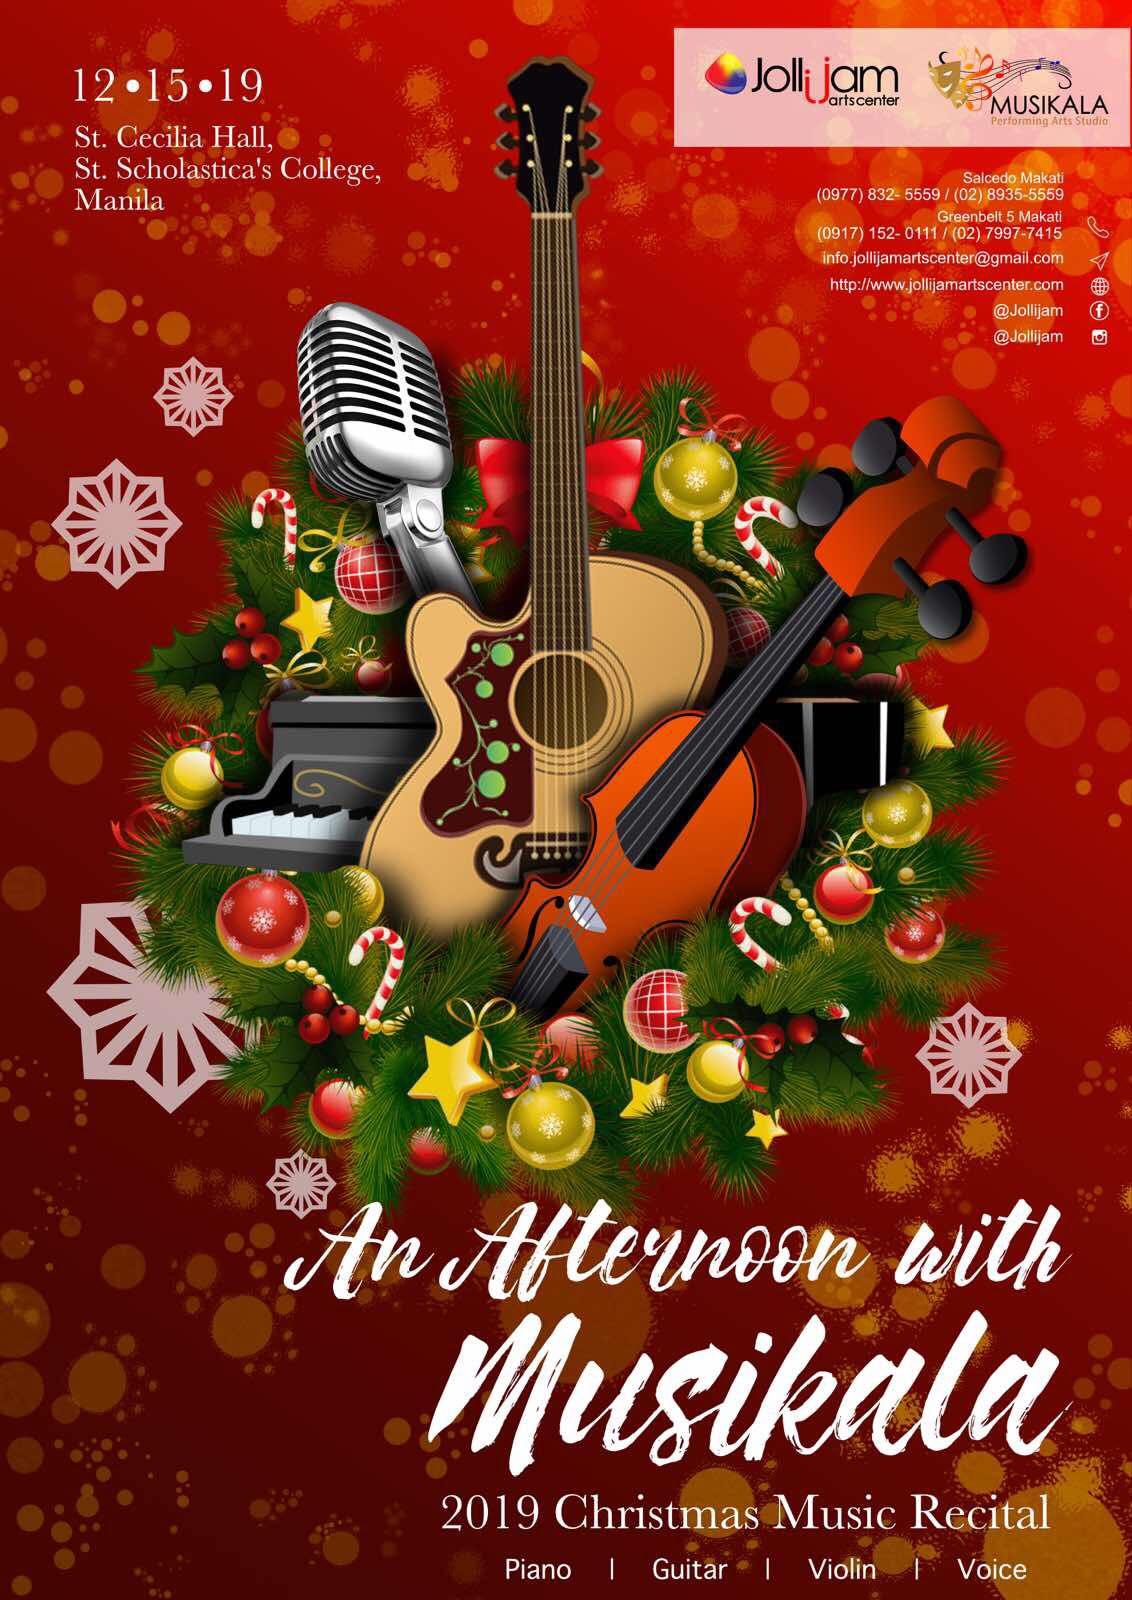 2019 Christmas Music Recital